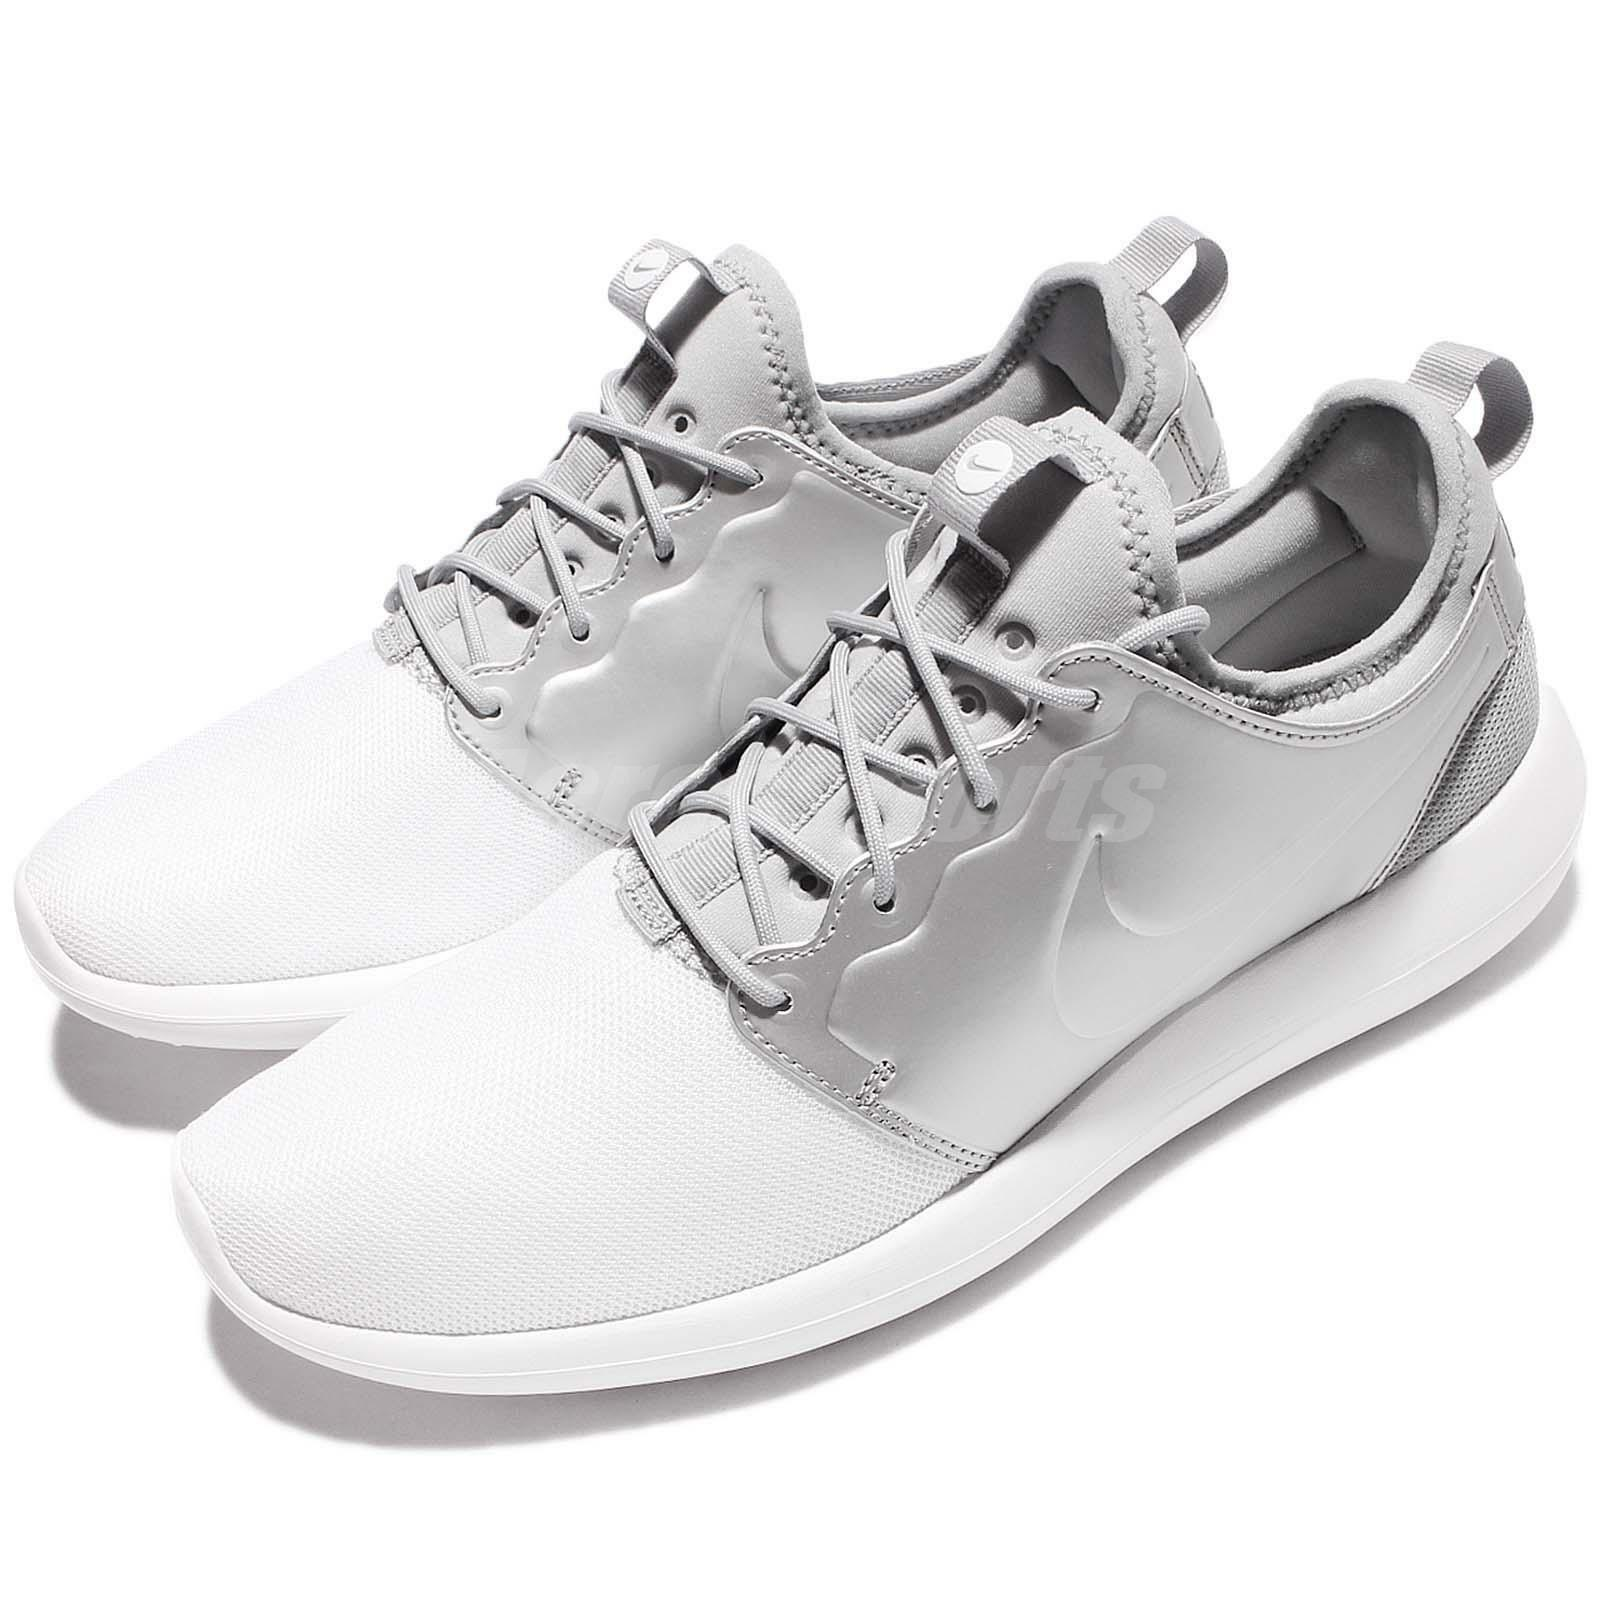 Nike Roshe Two 2 Rosherun Metallic Argent Men Running Chaussures Baskets 844656-100